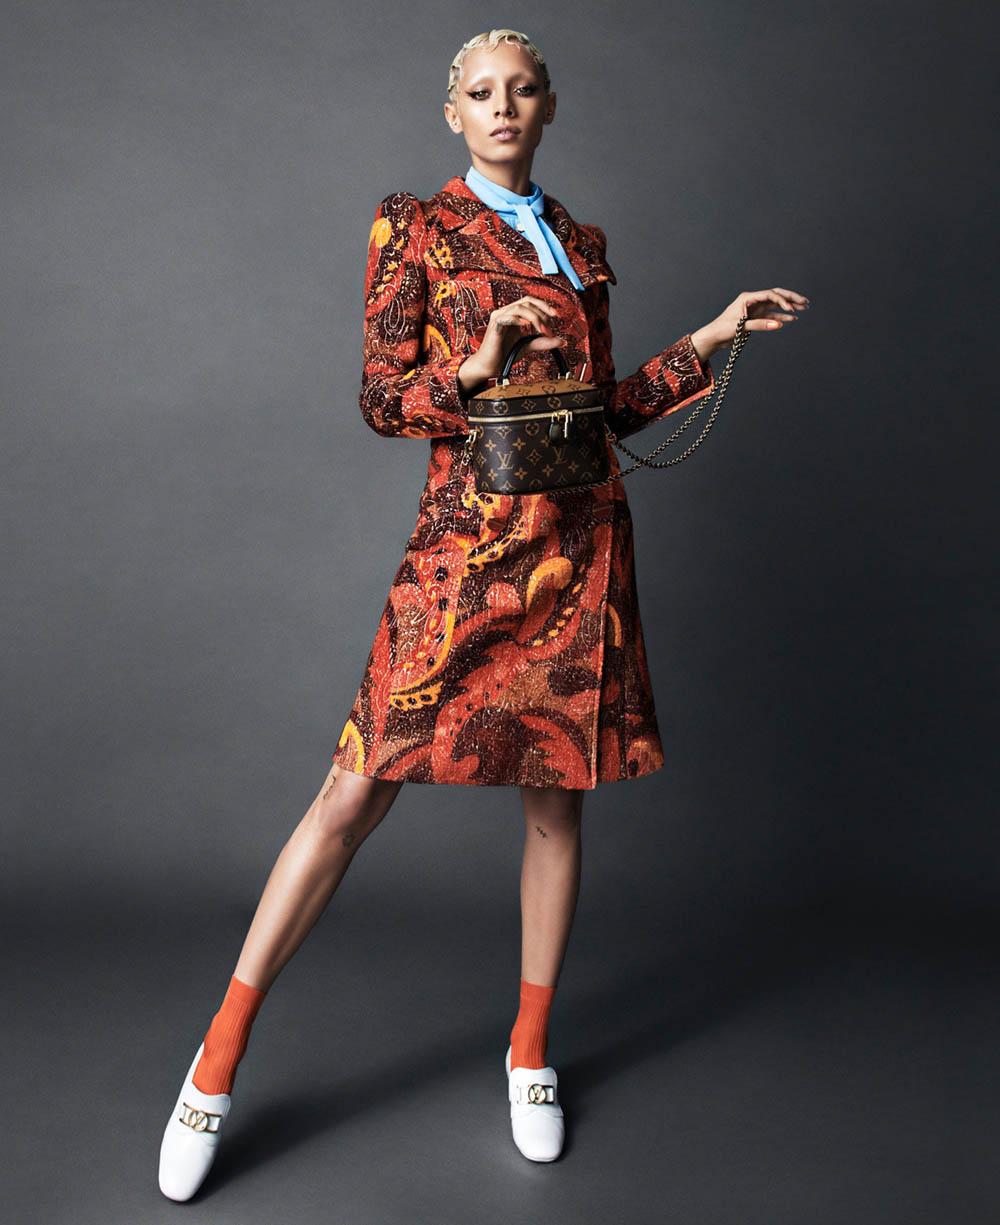 Jazzelle Zanaughtti by Desiree Mattsson for Elle US March 2020